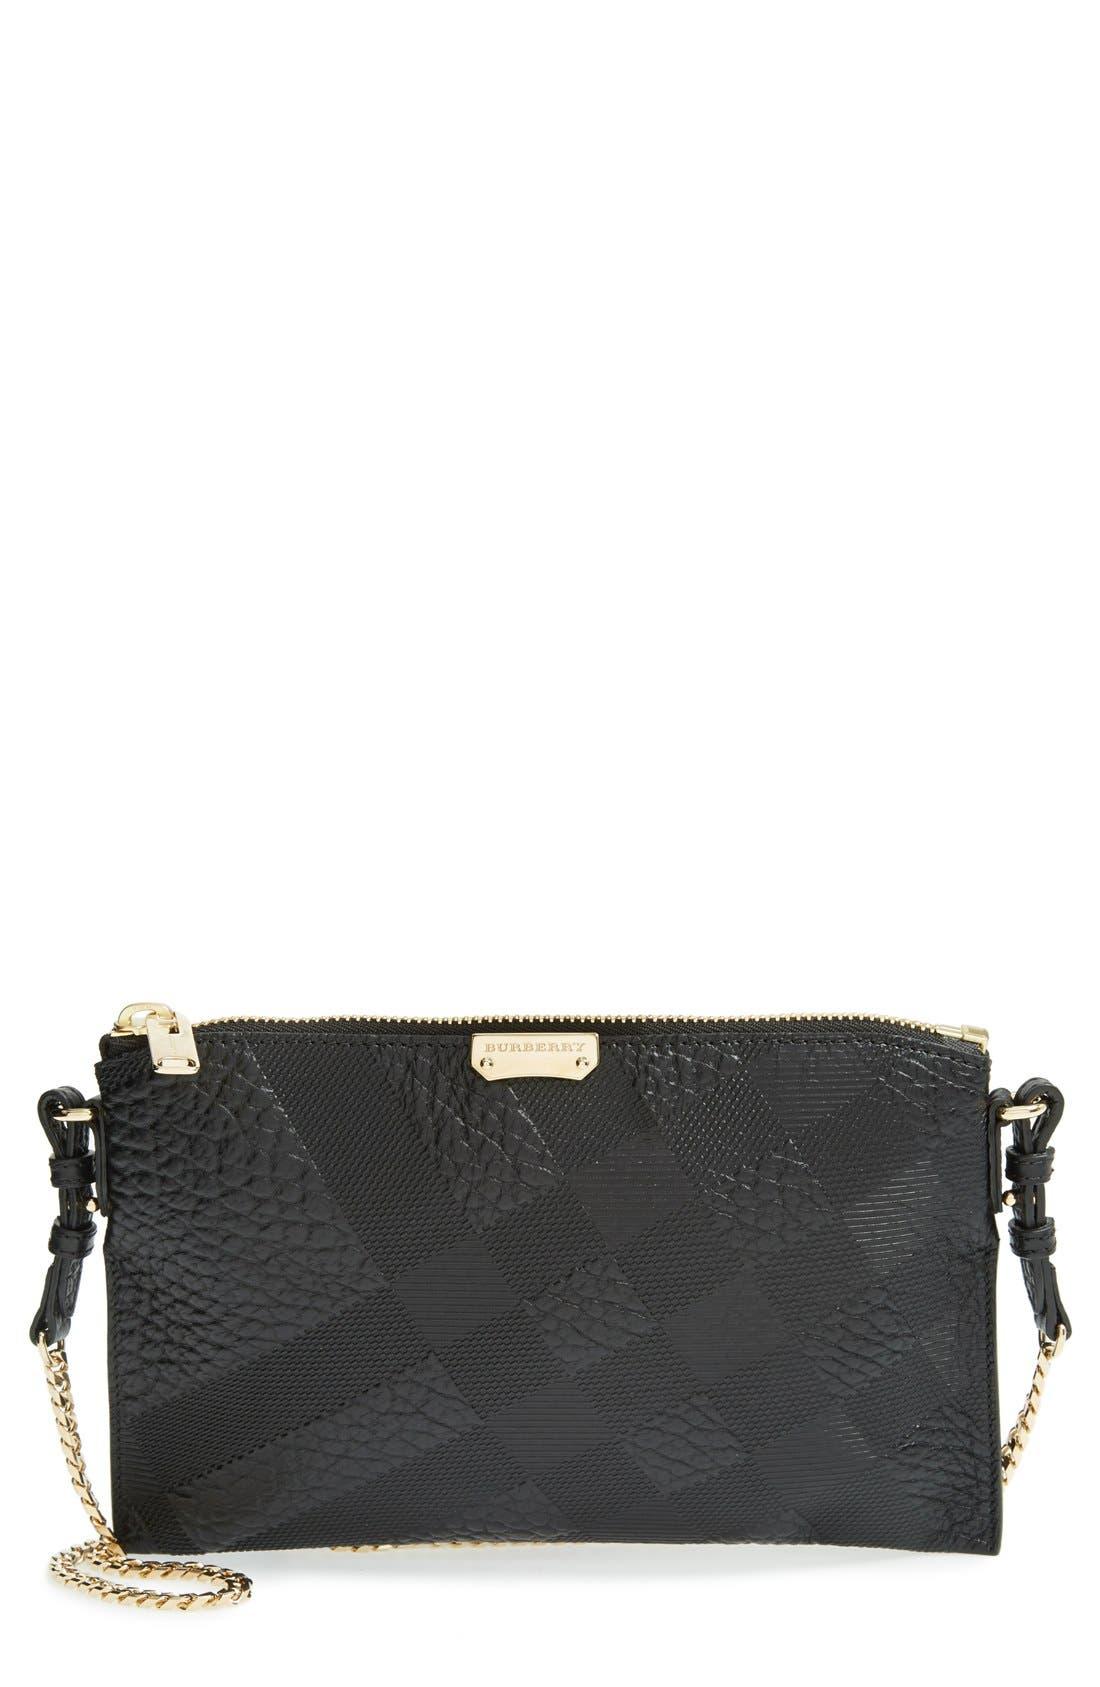 Main Image - Burberry 'Peyton - Grain Check' Embossed Leather Crossbody Bag